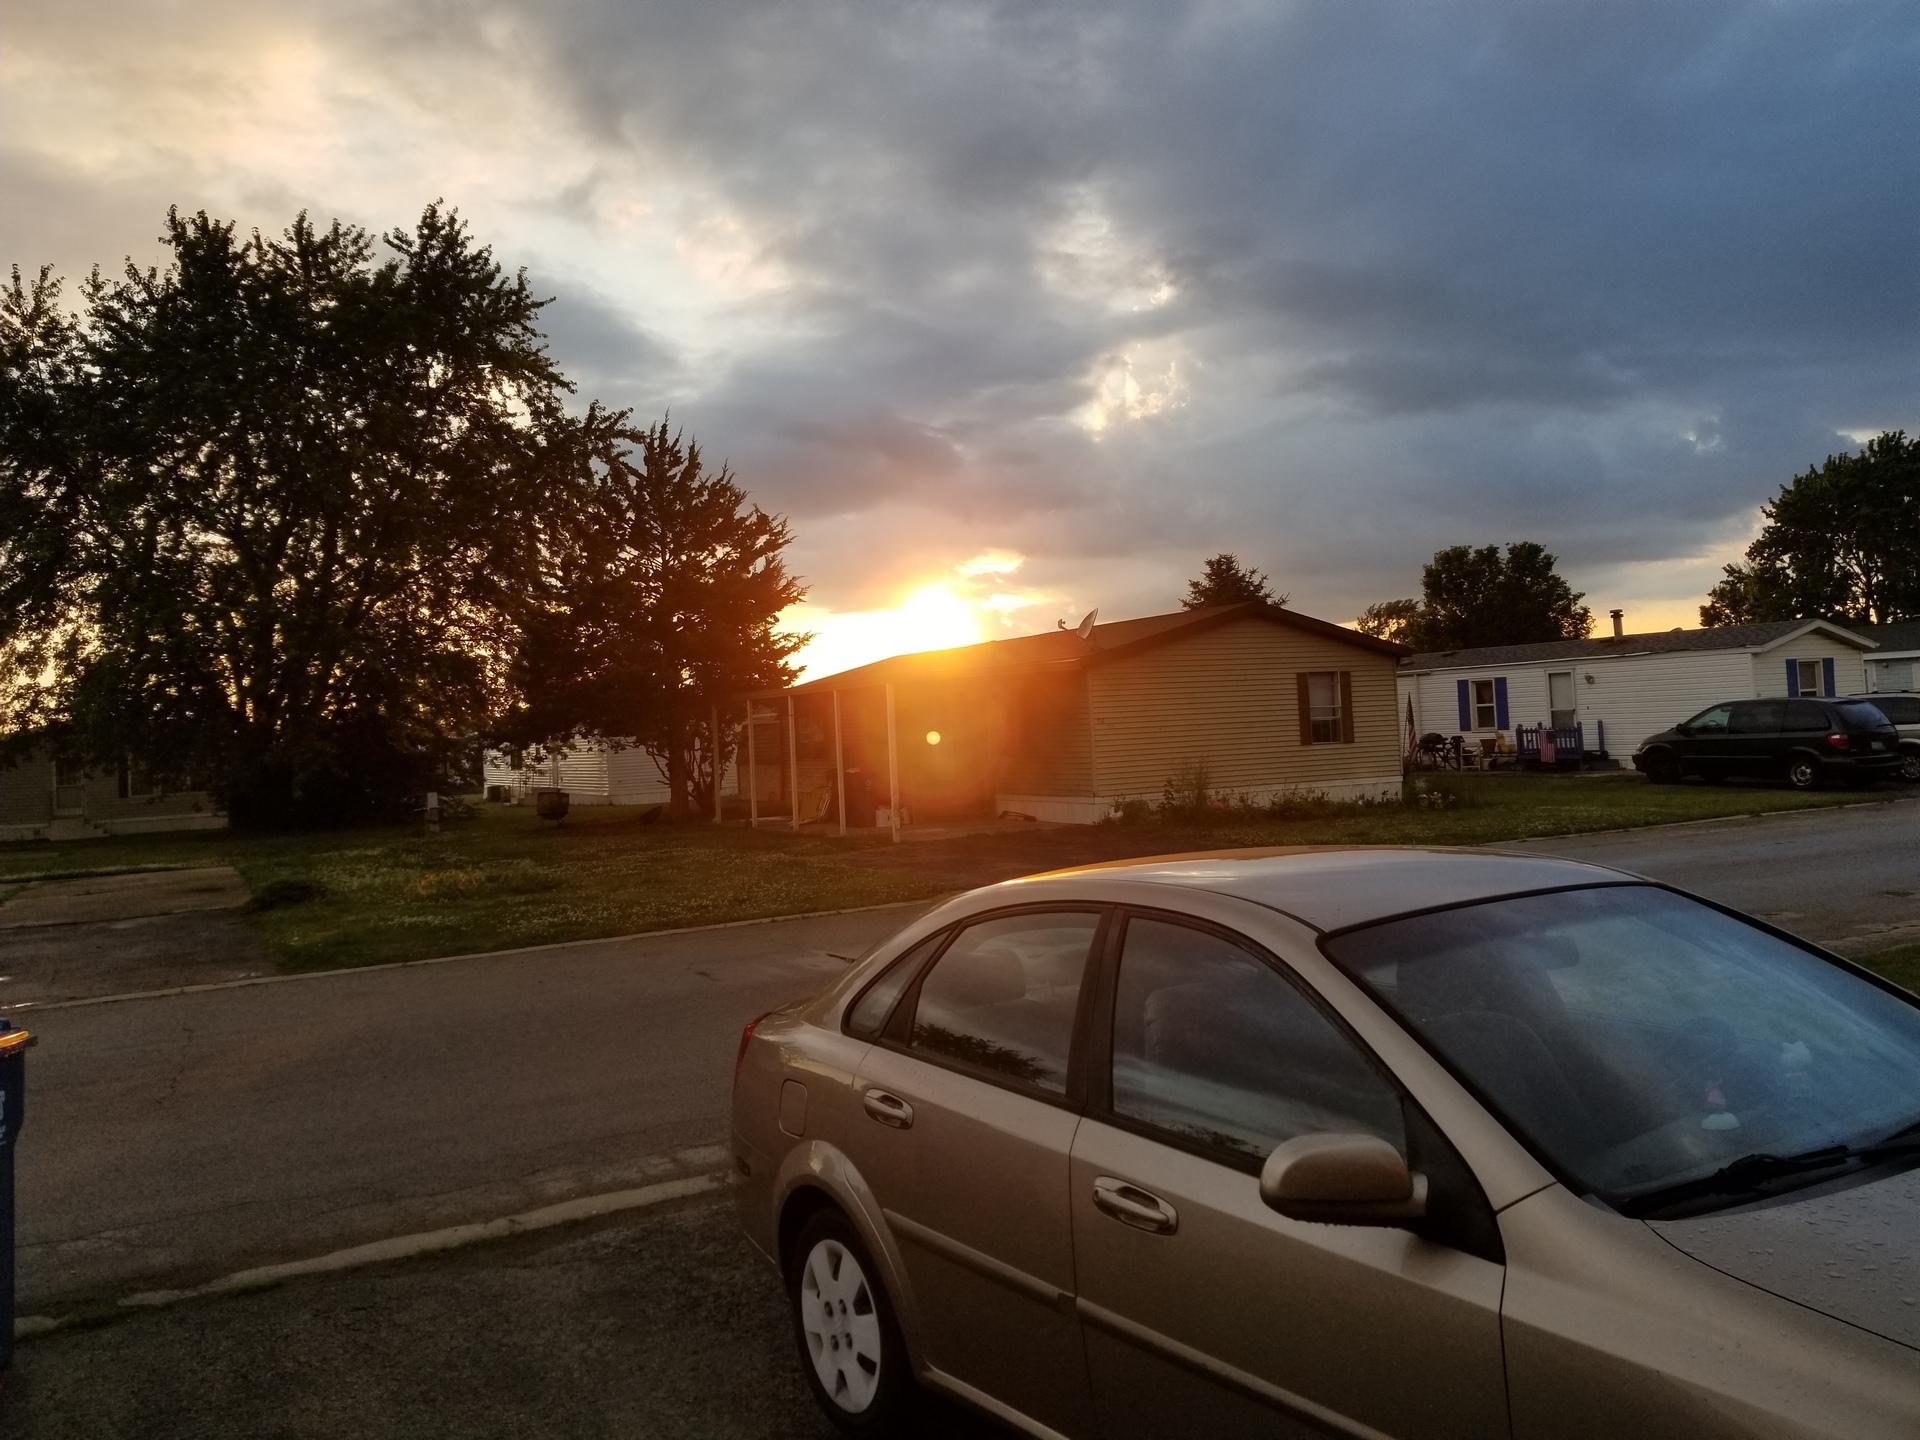 Tra | codenamesailorearth, asphalt, blacktop, car